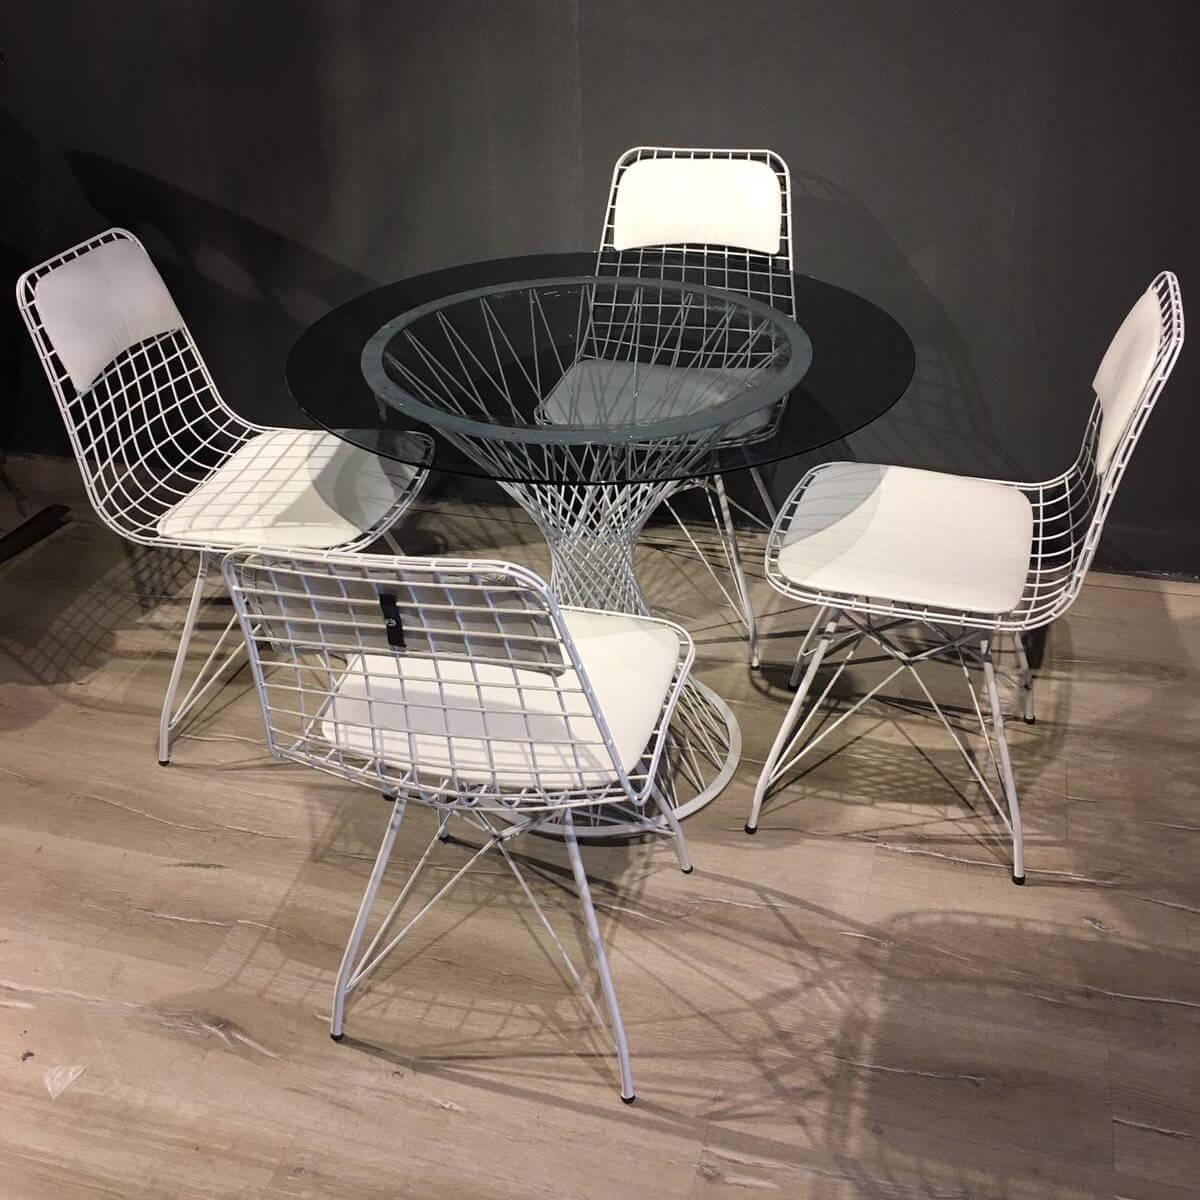 metal-tel-masa-sandalye-takimi-yuvarlak-masa-46209